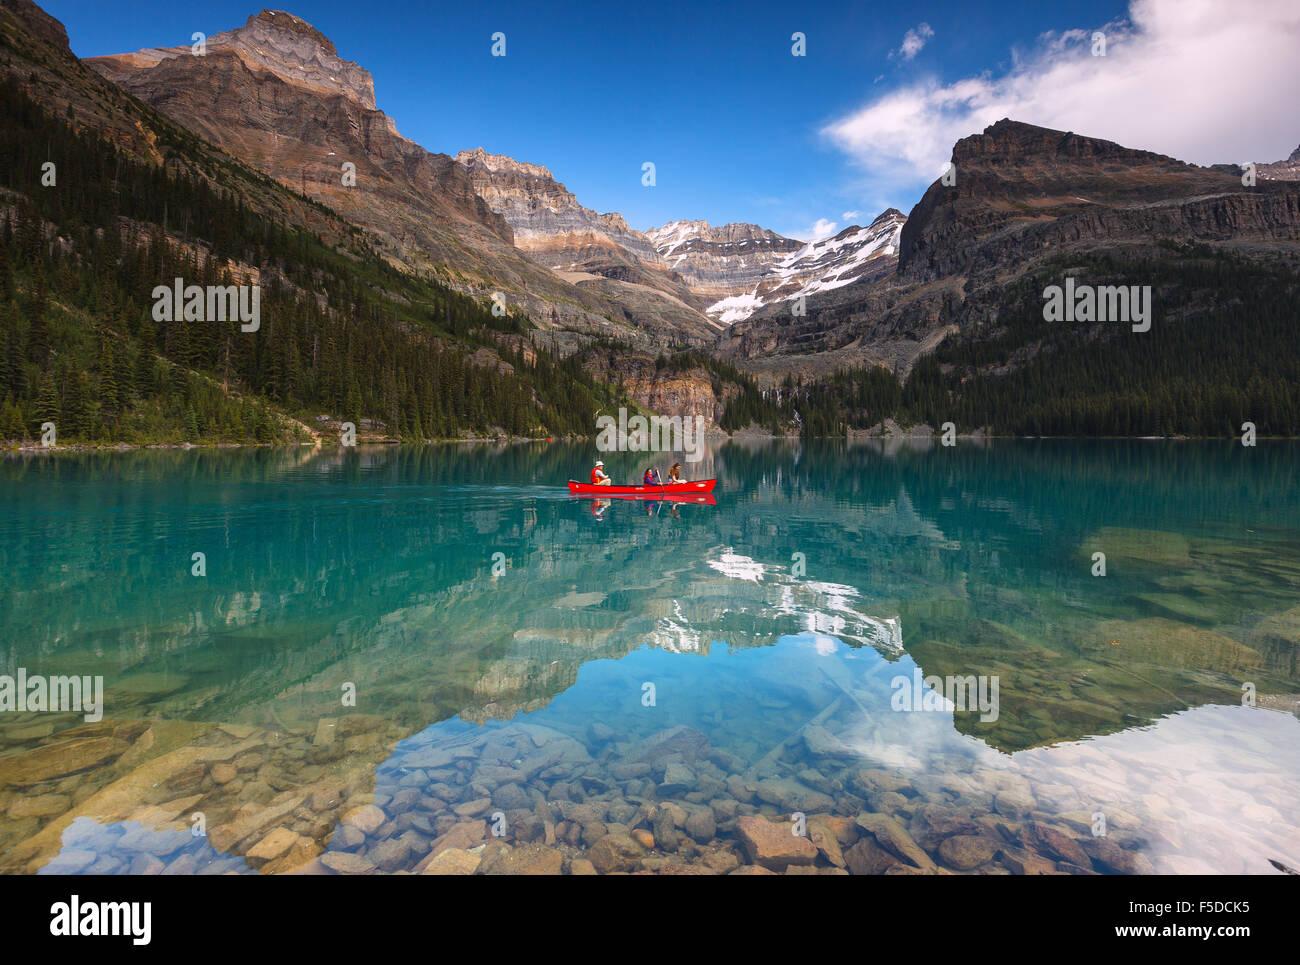 Ein paar Kanu am wunderschönen Lake O'Hara im Yoho National Park, British Columbia, Kanada, Amerika. Stockbild